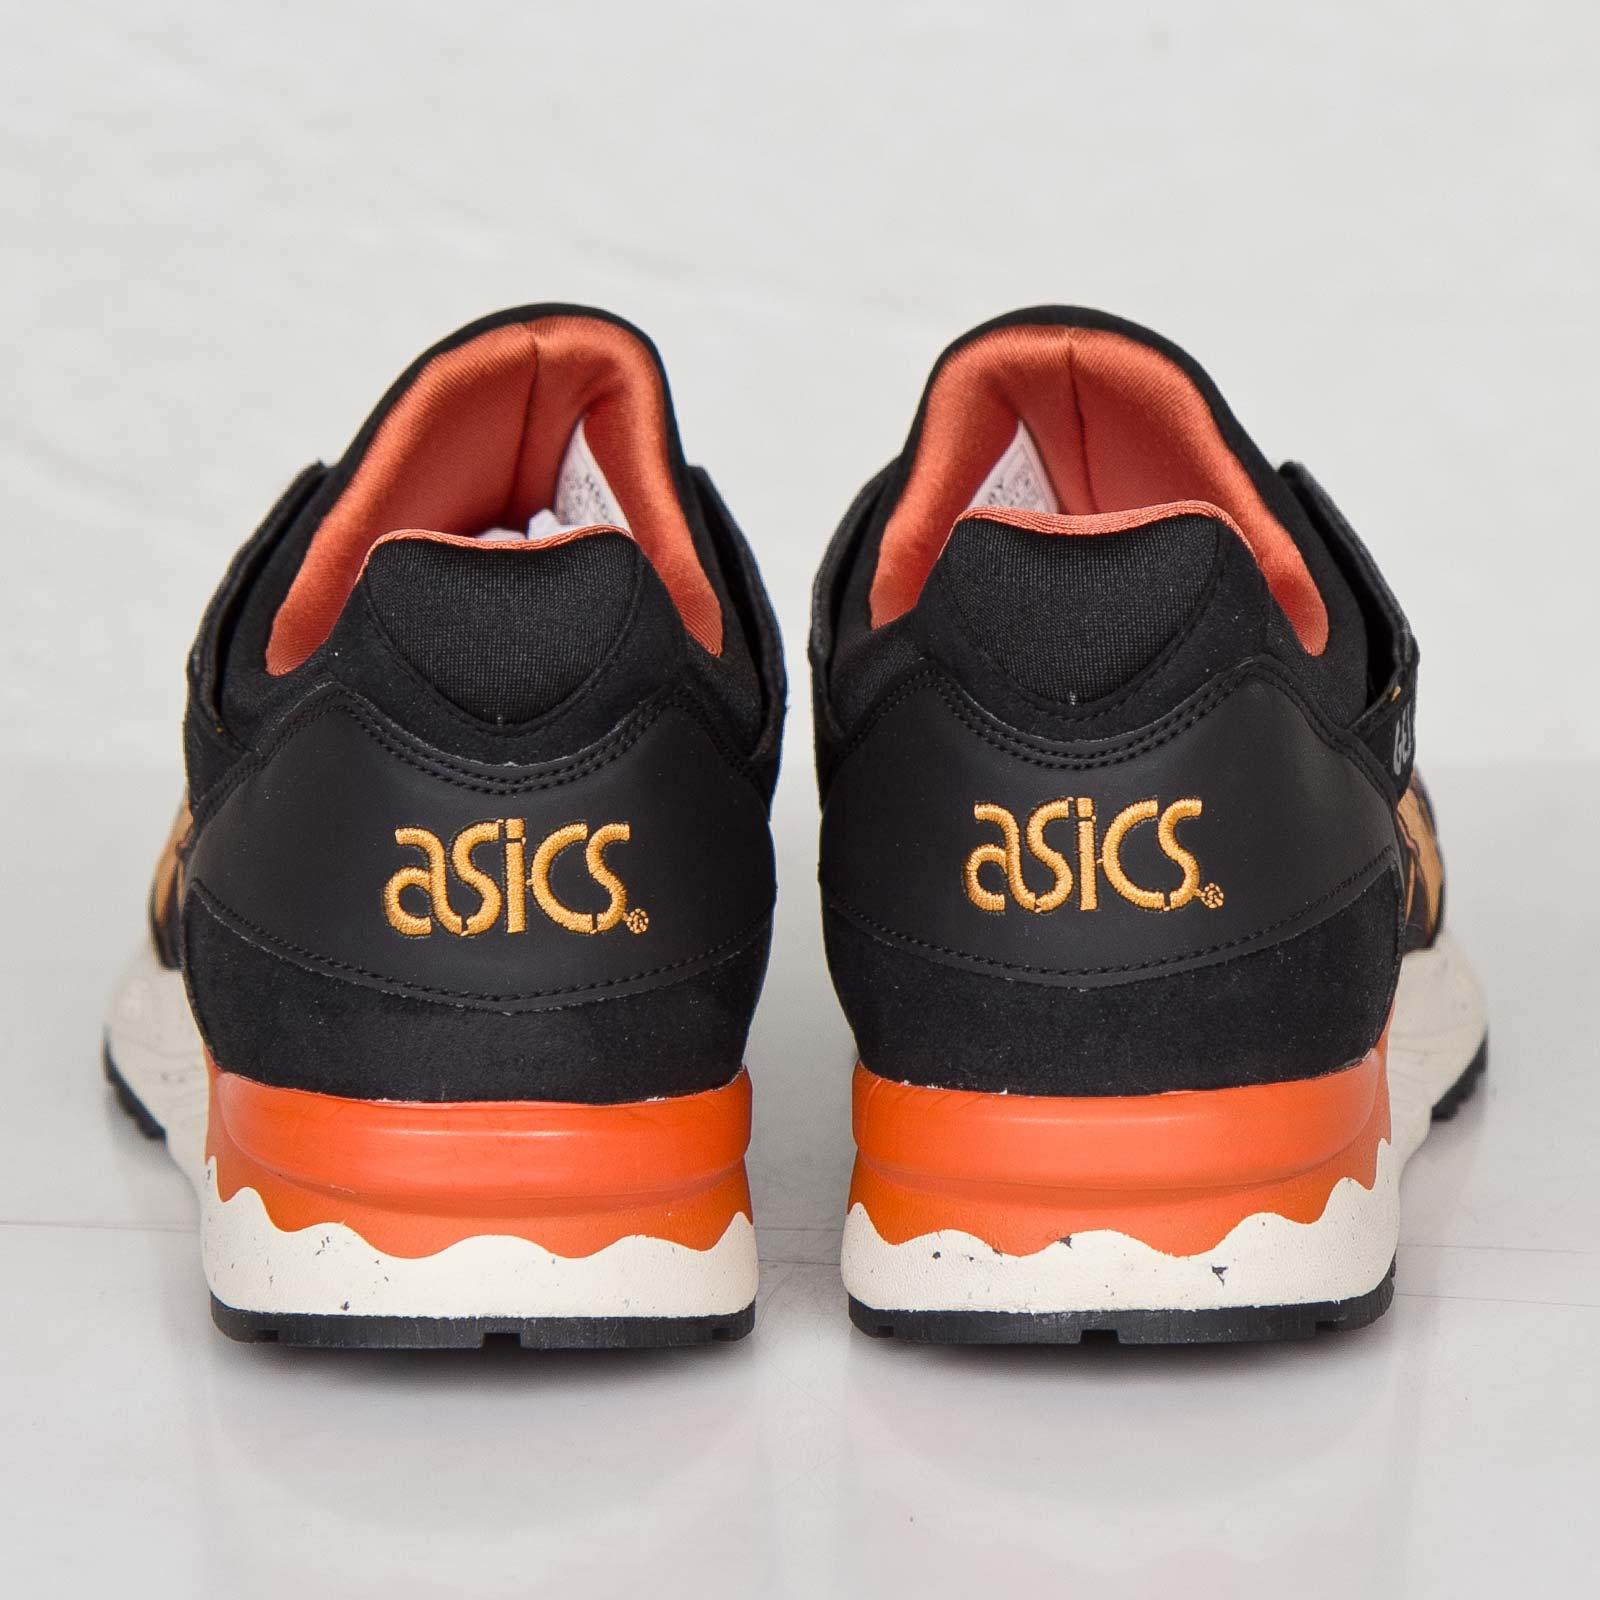 reputable site 43f3d 506f0 ASICS Tiger Gel-Lyte V - H5d0y-9071 - Sneakersnstuff ...